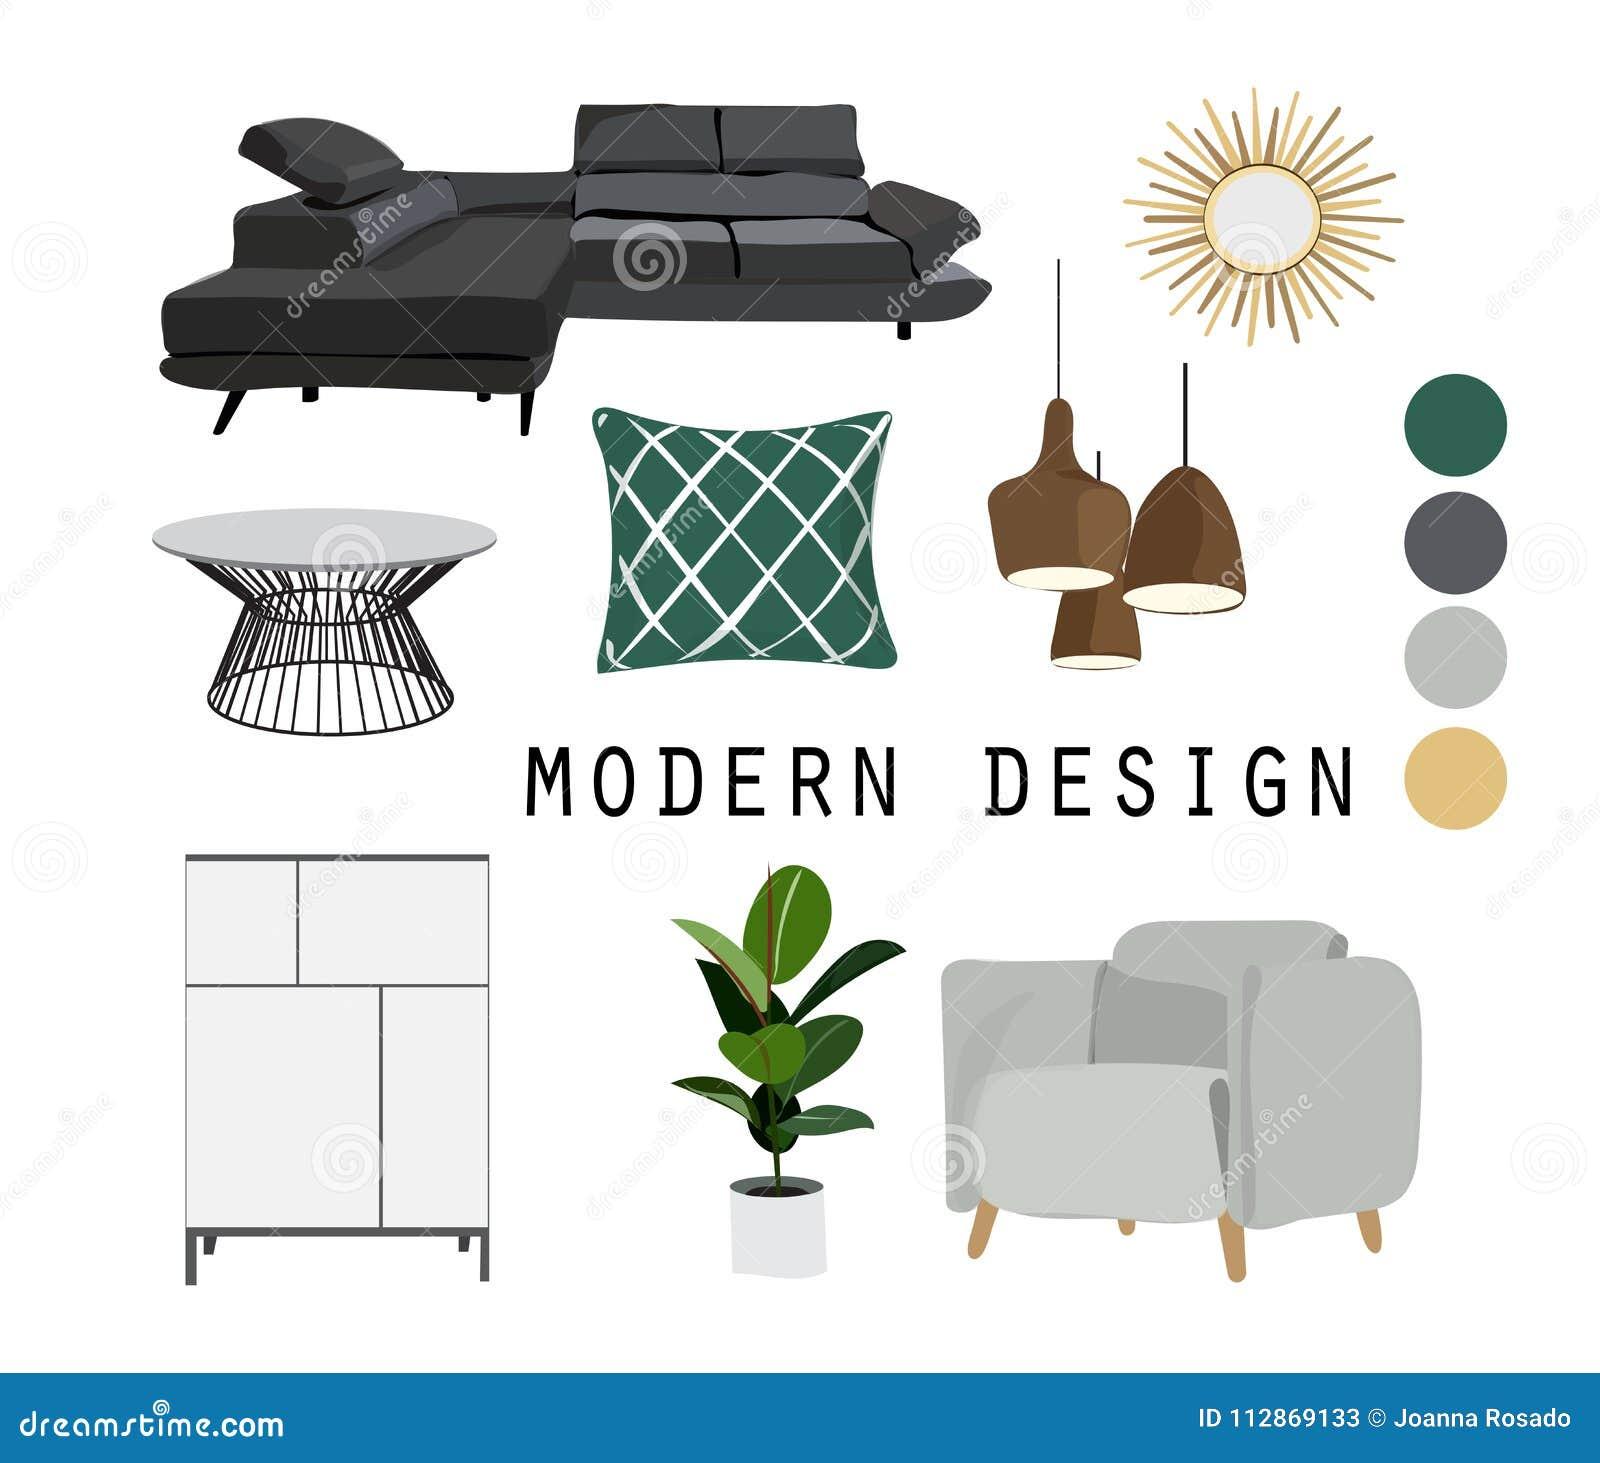 Vector Interior Design Mood Board Illustration Living Room Furniture Stock Vector Illustration Of Board Decoration 112869133,Scandinavian Style Livingroom